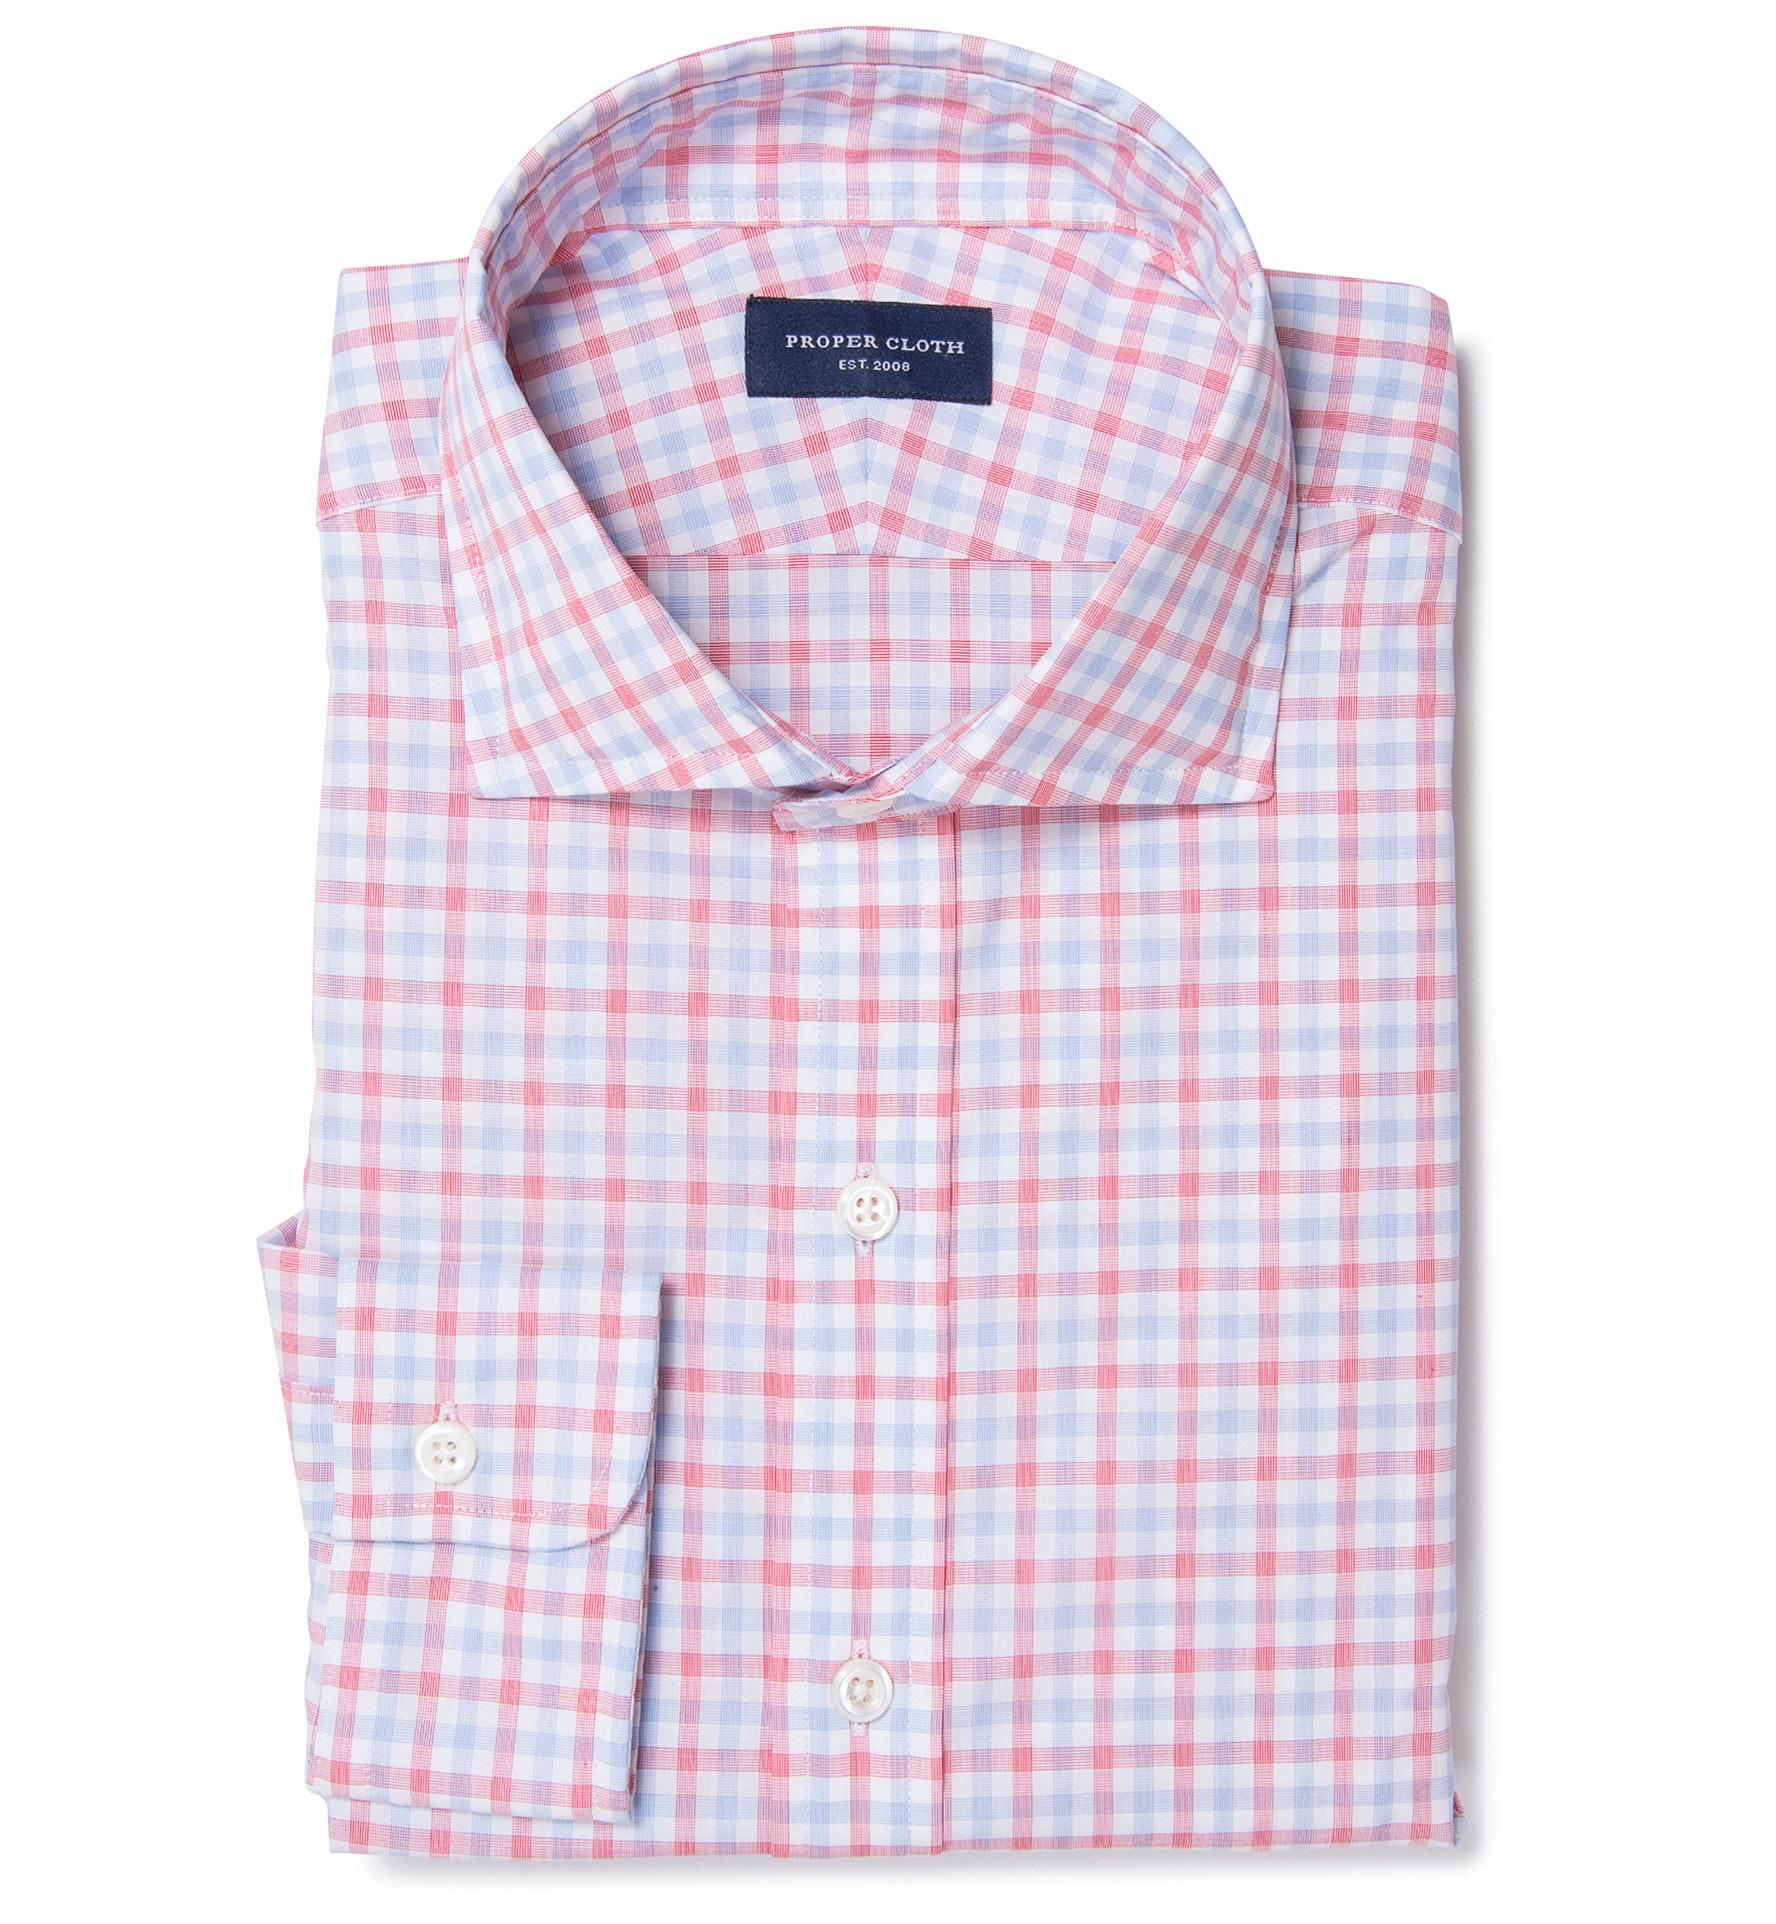 Thomas mason red multi check dress shirt by proper cloth for Thomas mason dress shirts